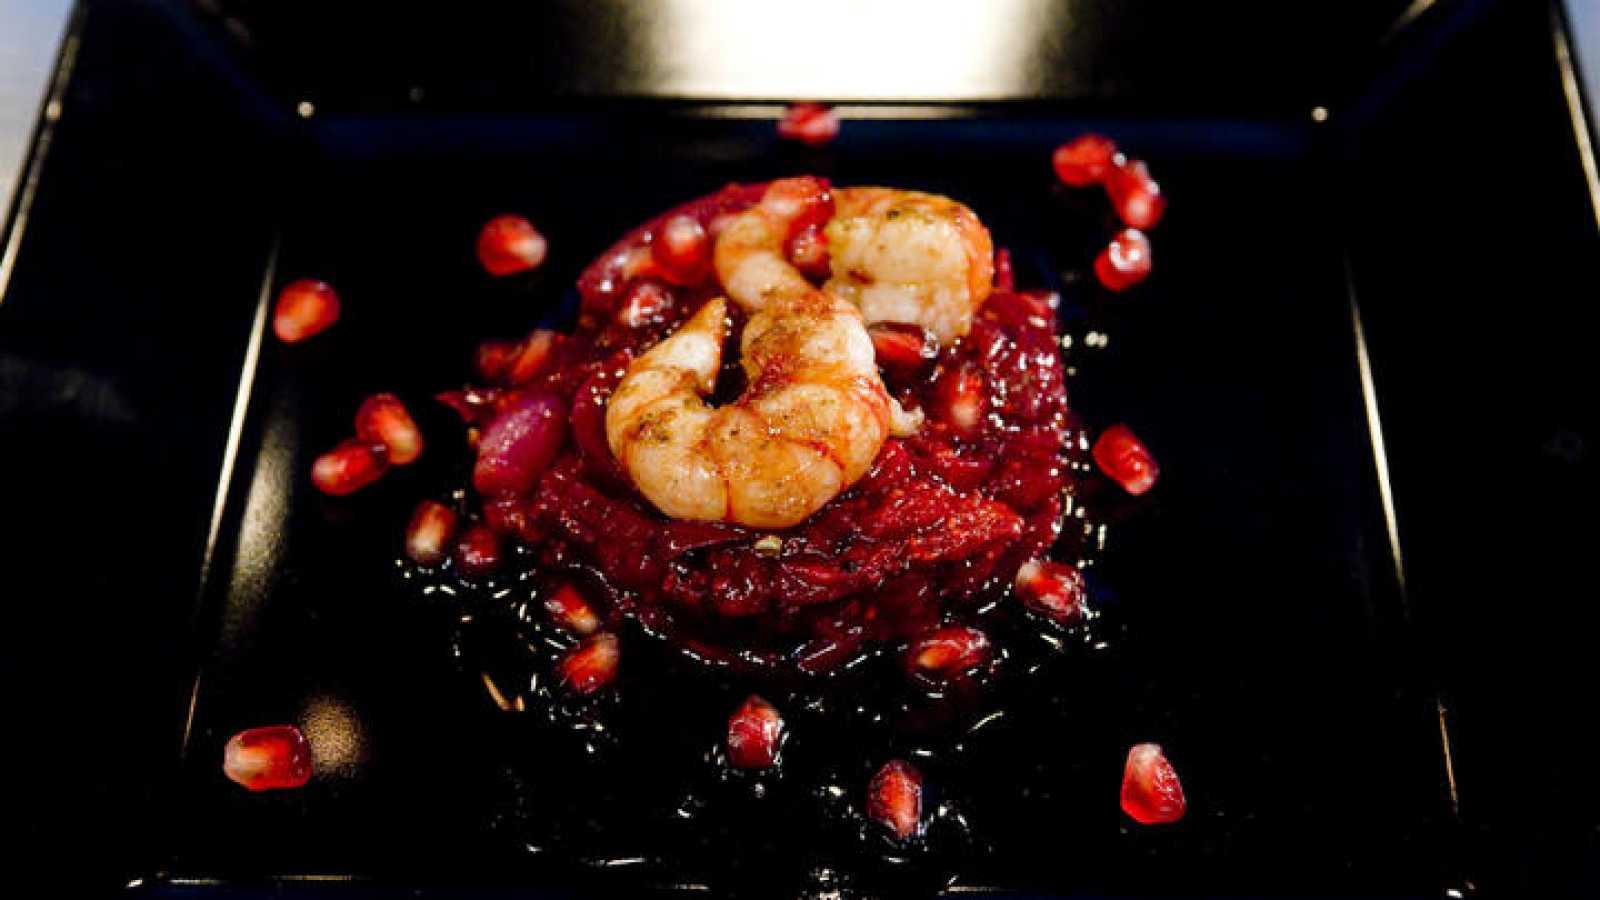 Receta de escabeche de frutos rojos con gambas